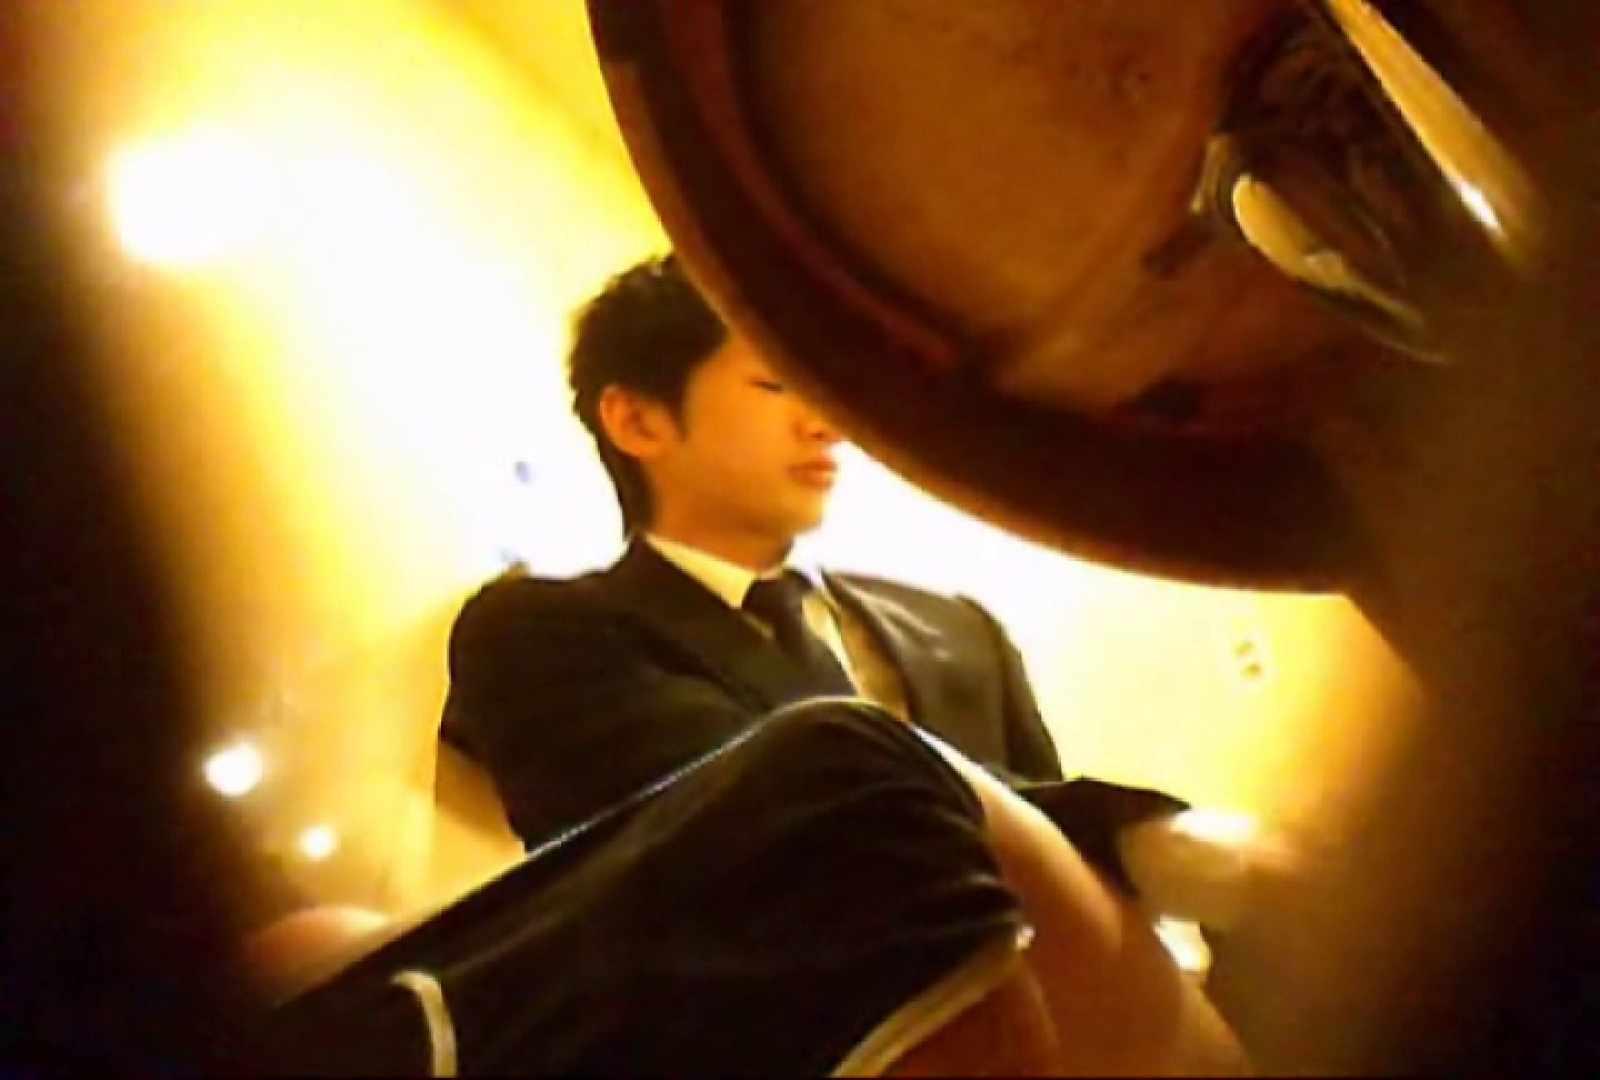 SEASON 3rd!掴み取りさんの洗面所覗き!in新幹線!VOL.23 完全無修正  81pic 14